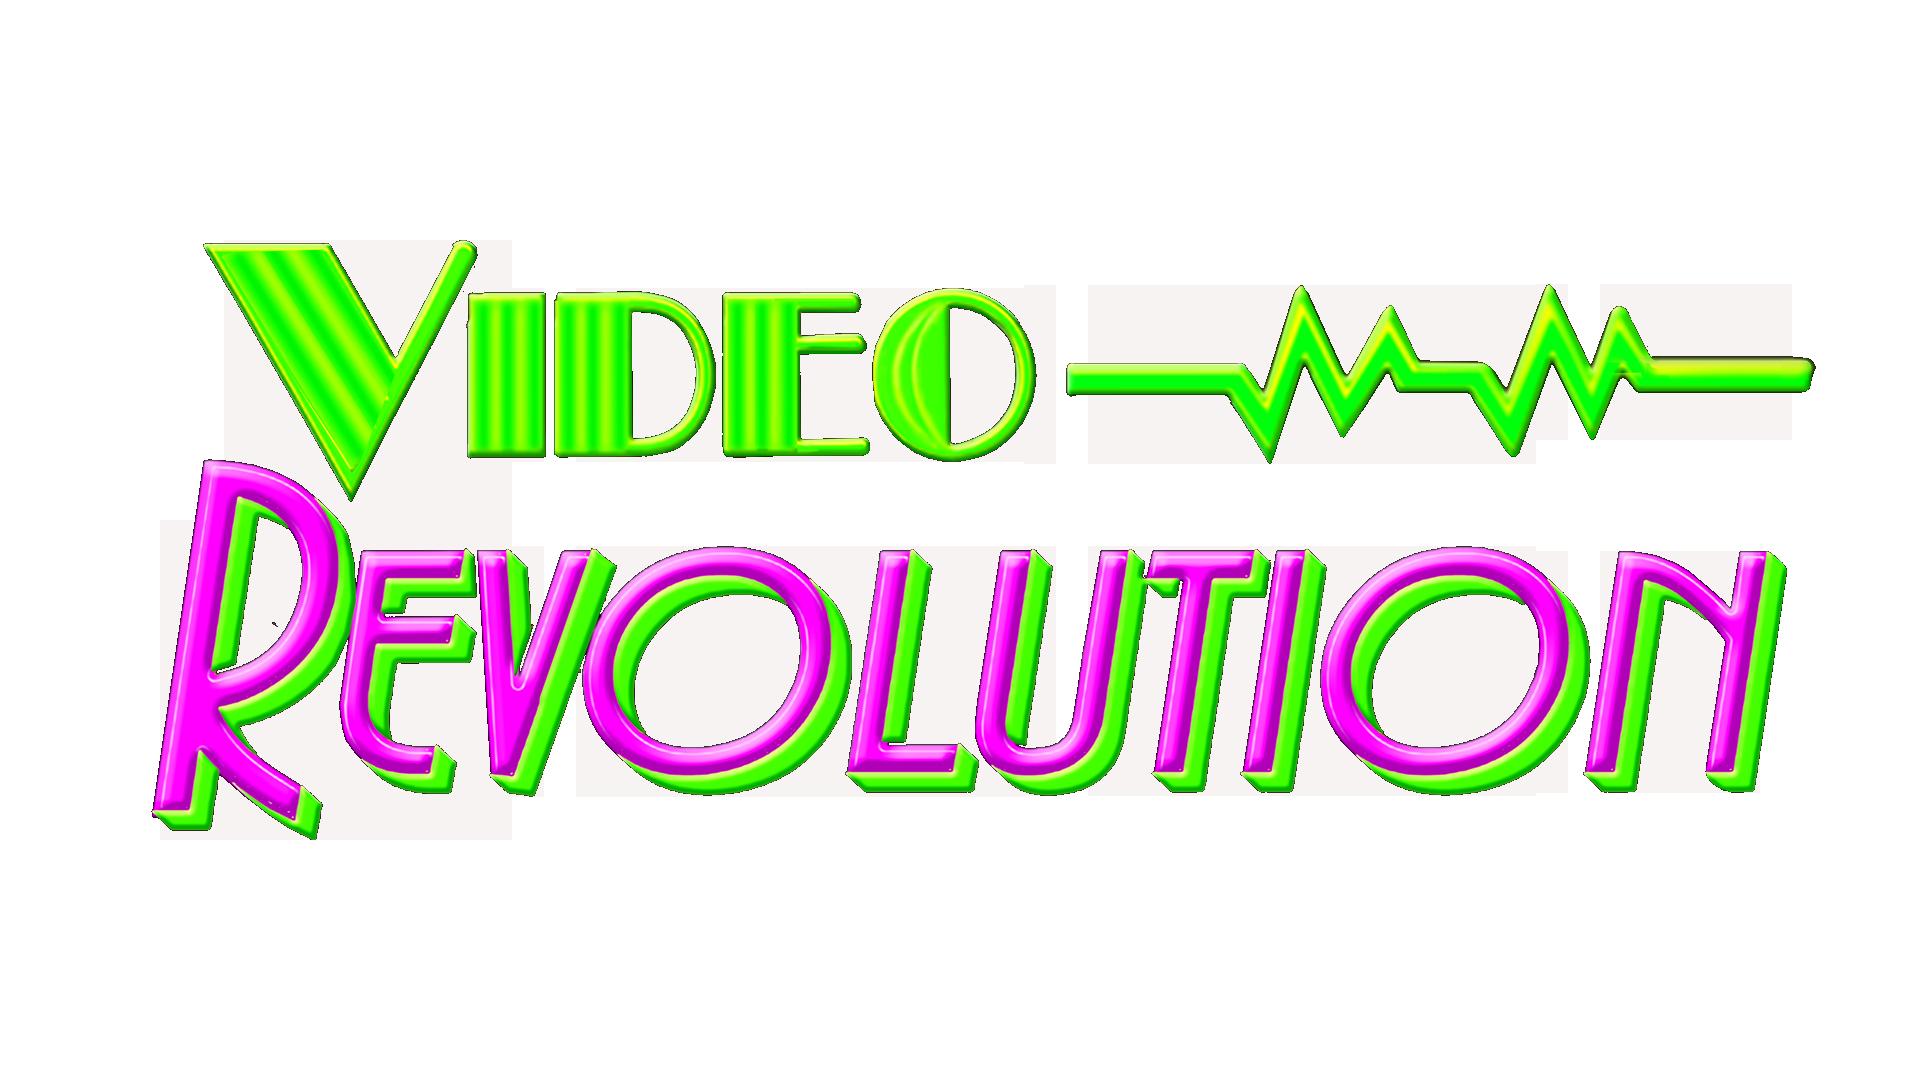 Video Revolution image 7